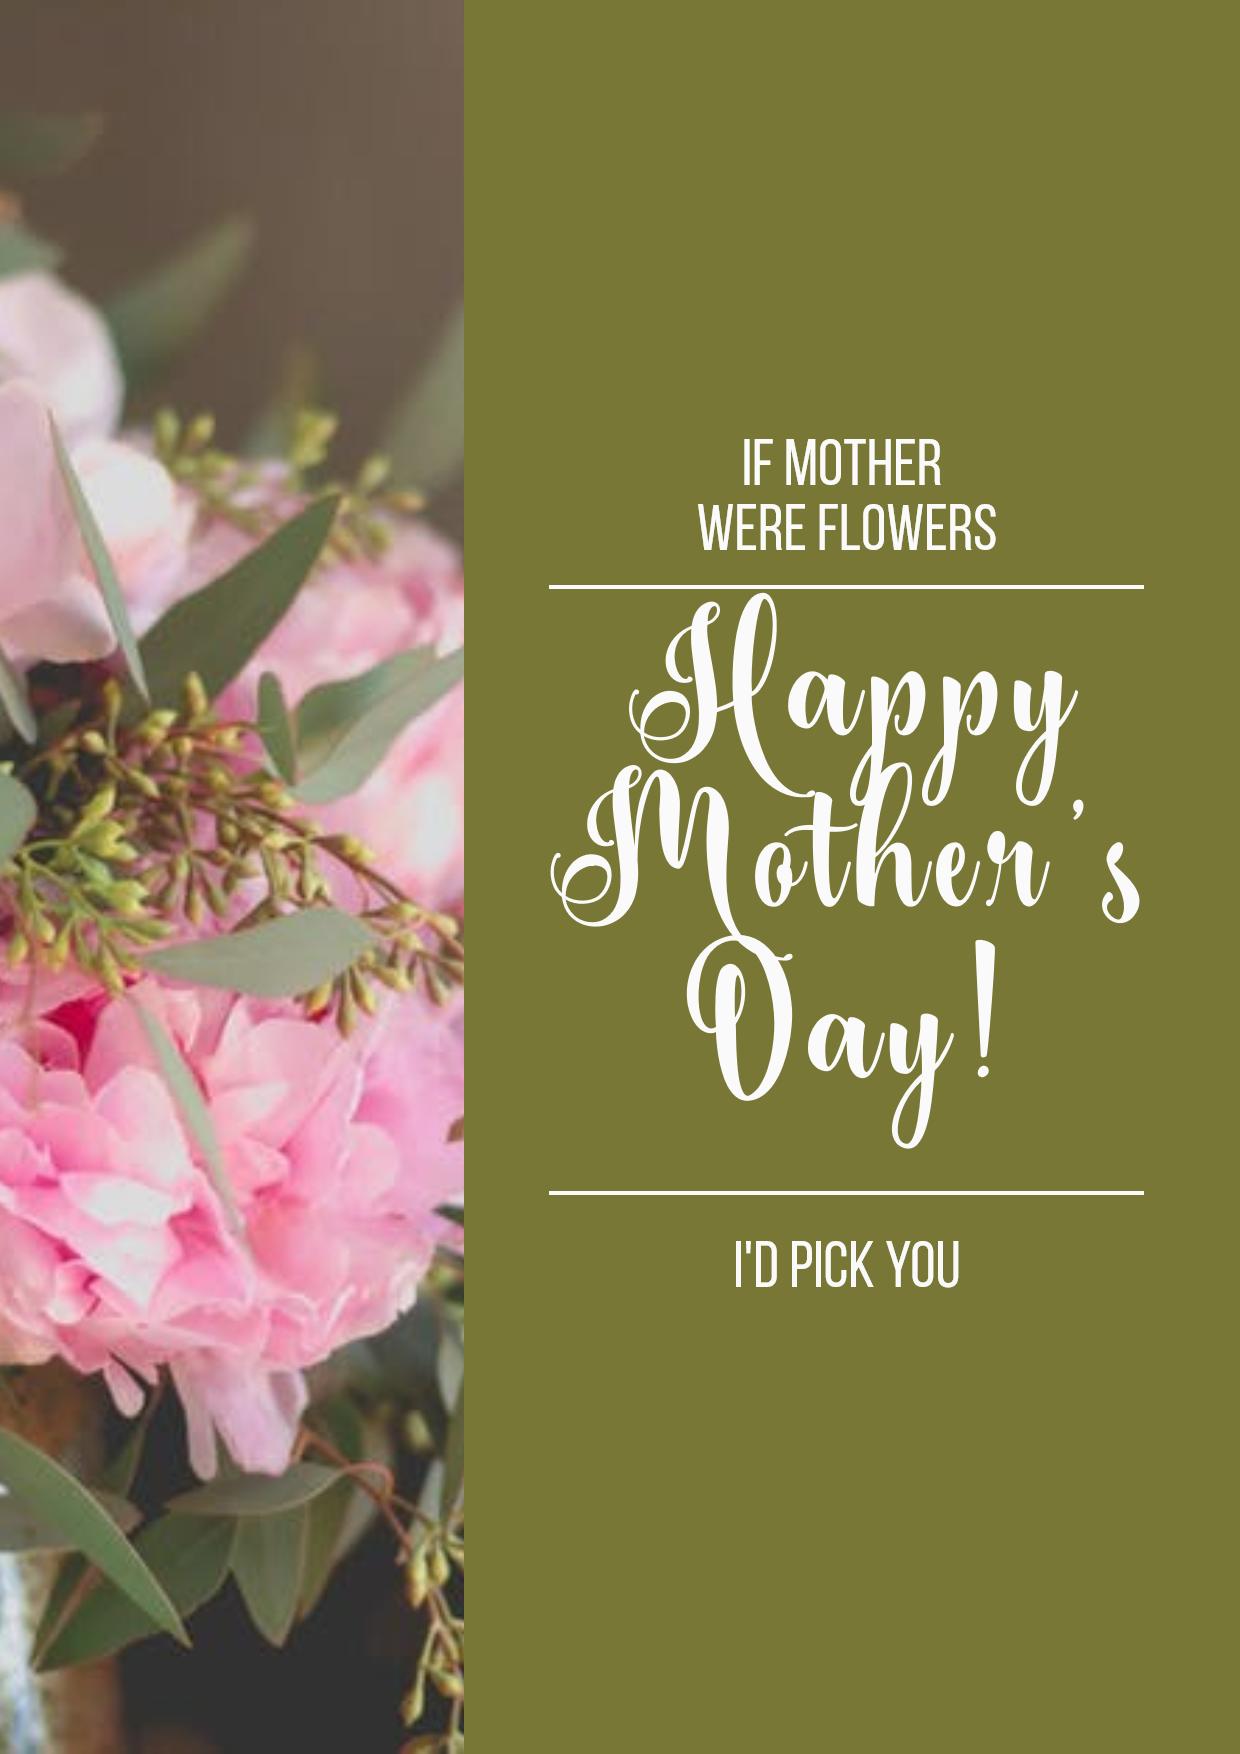 Flower,                Plant,                Flora,                Land,                Flowering,                Anniversary,                Mother,                Love,                White,                Black,                 Free Image